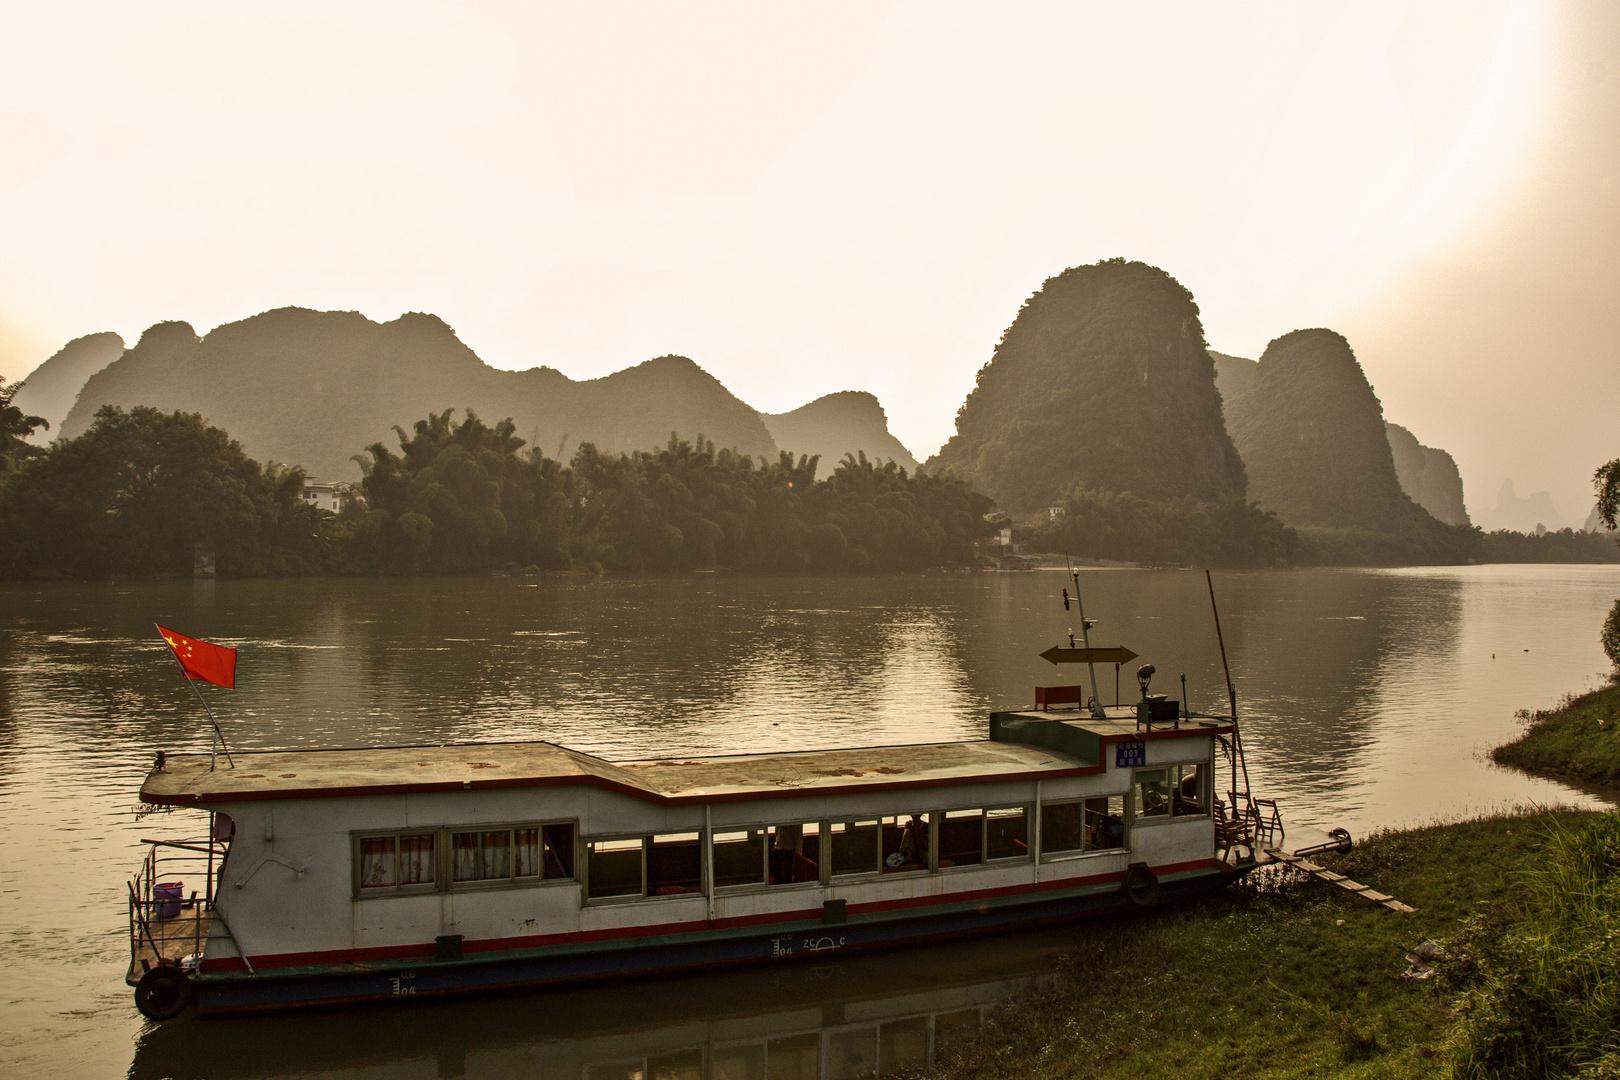 439 - Yangshuo - Karst Peaks and Lijiang River